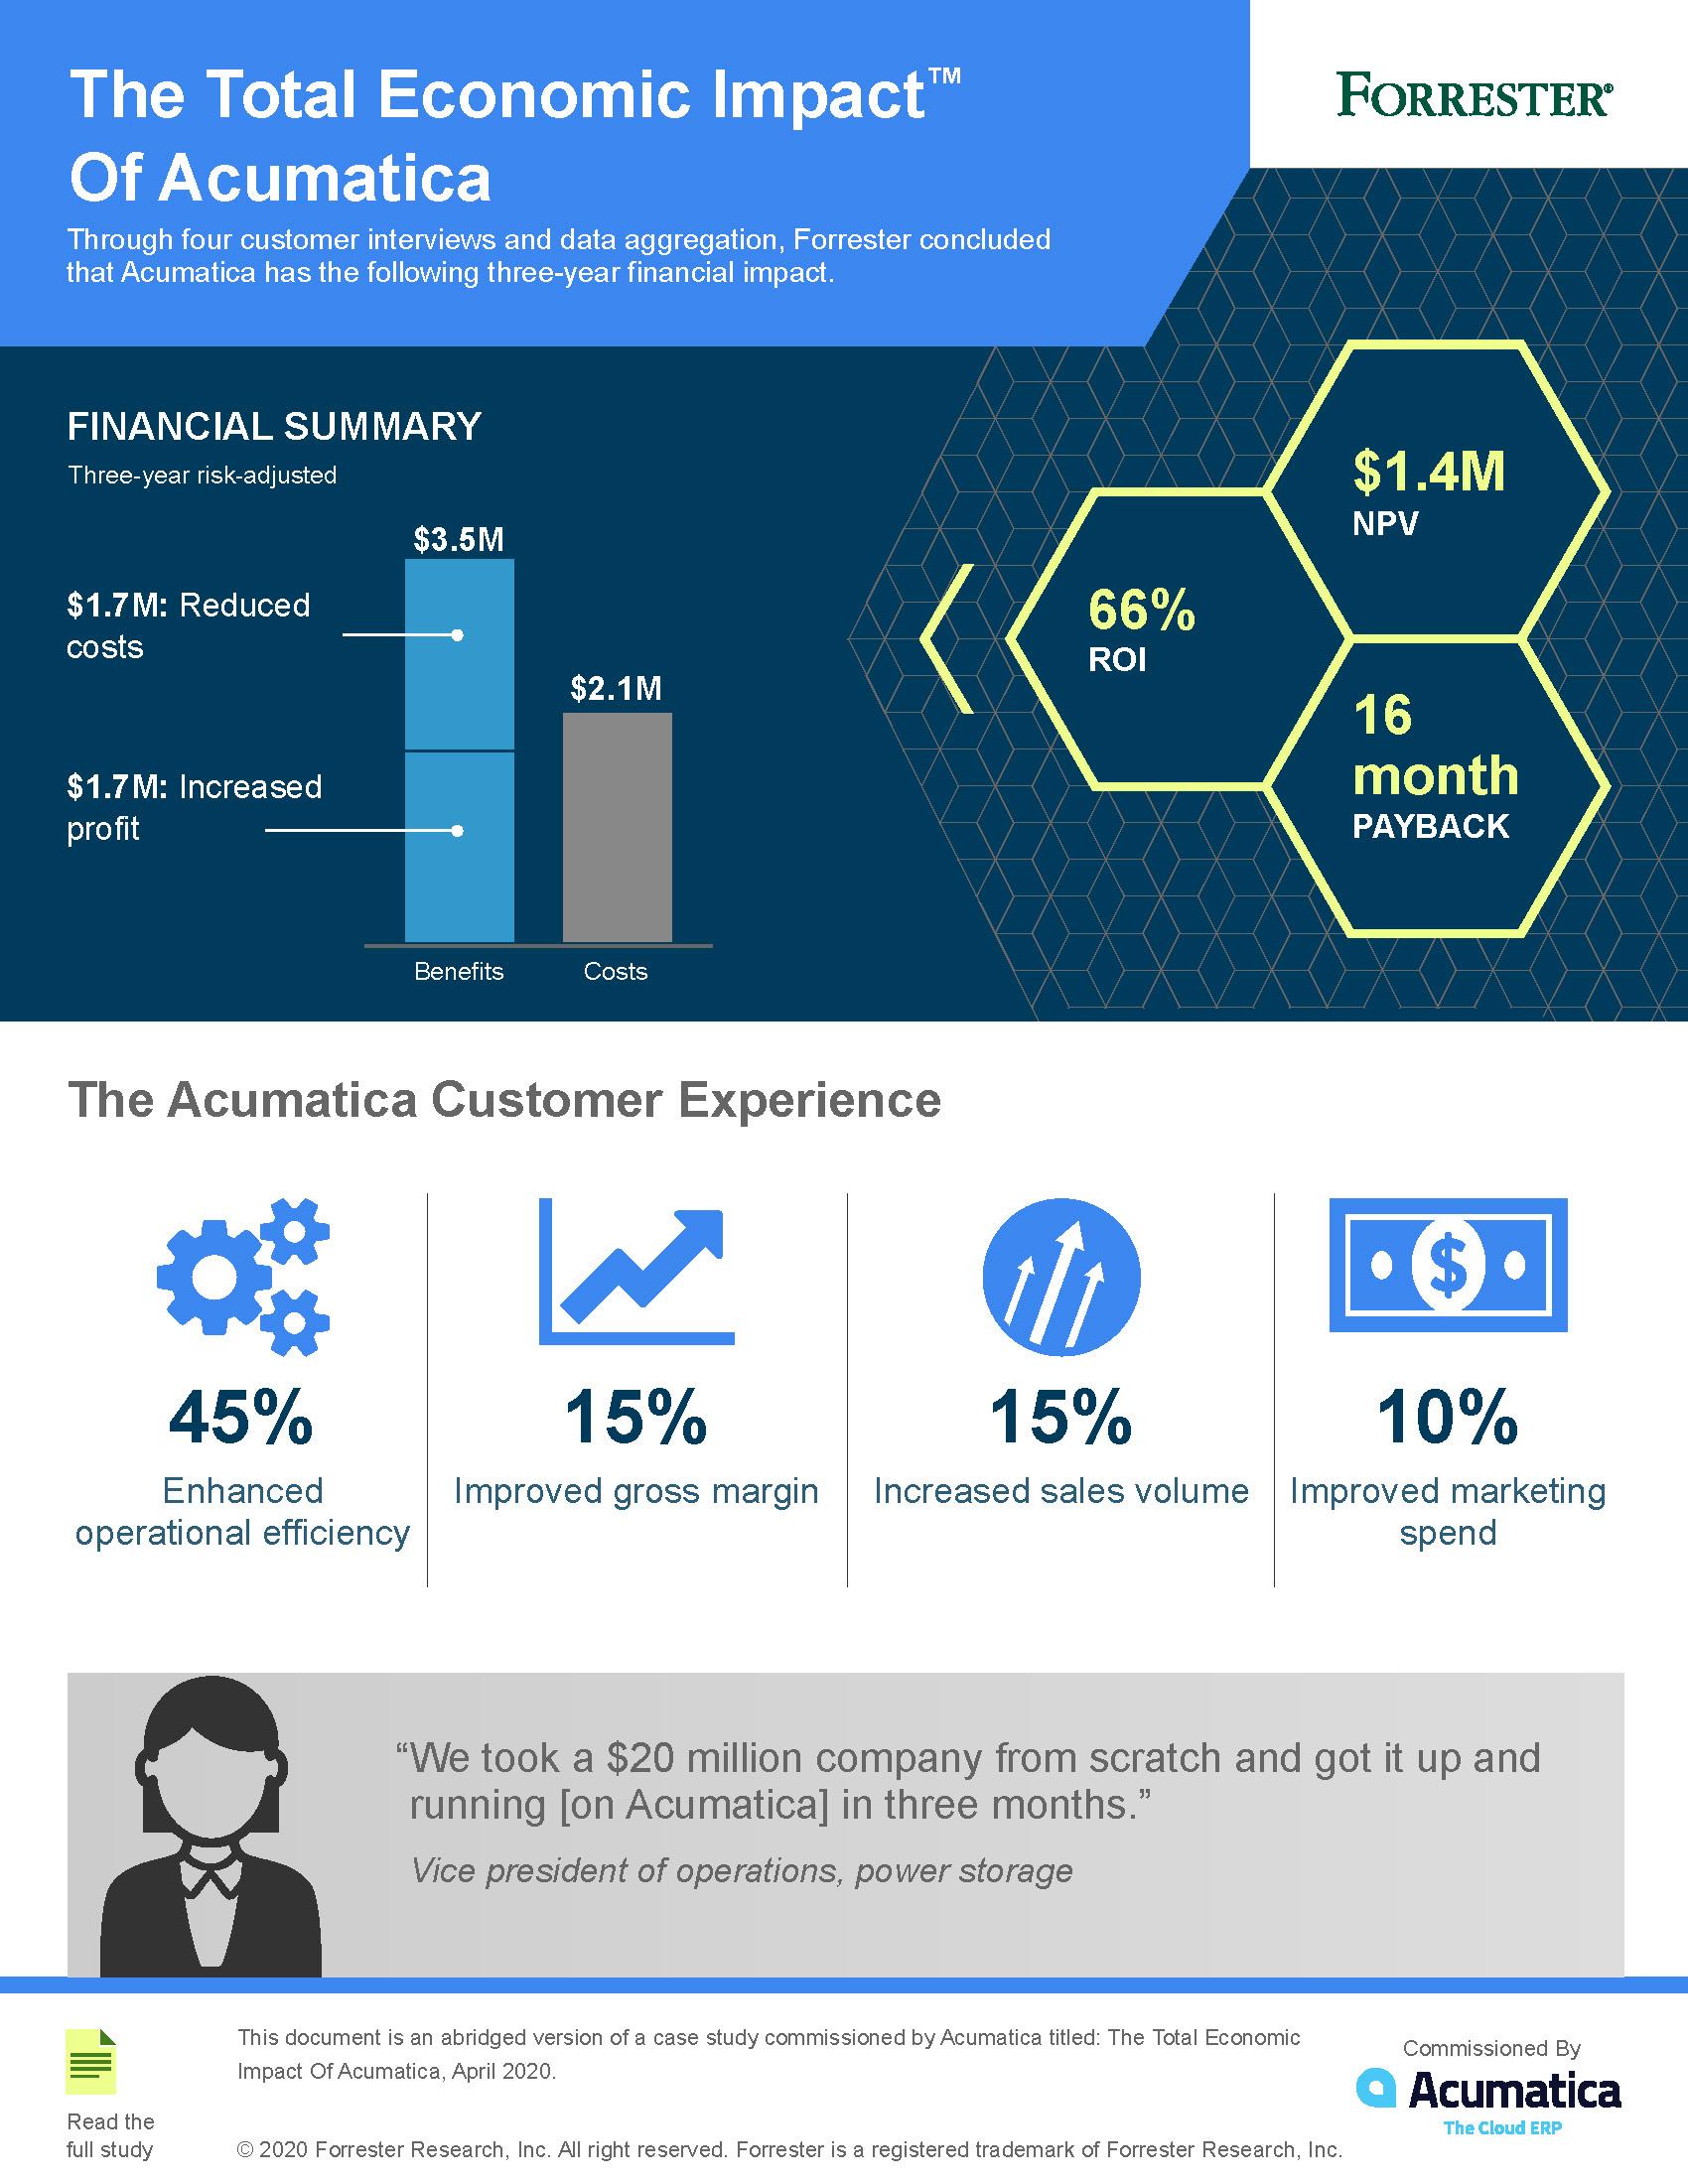 Total-Economic-Impact-of-Acumatica-Infographic